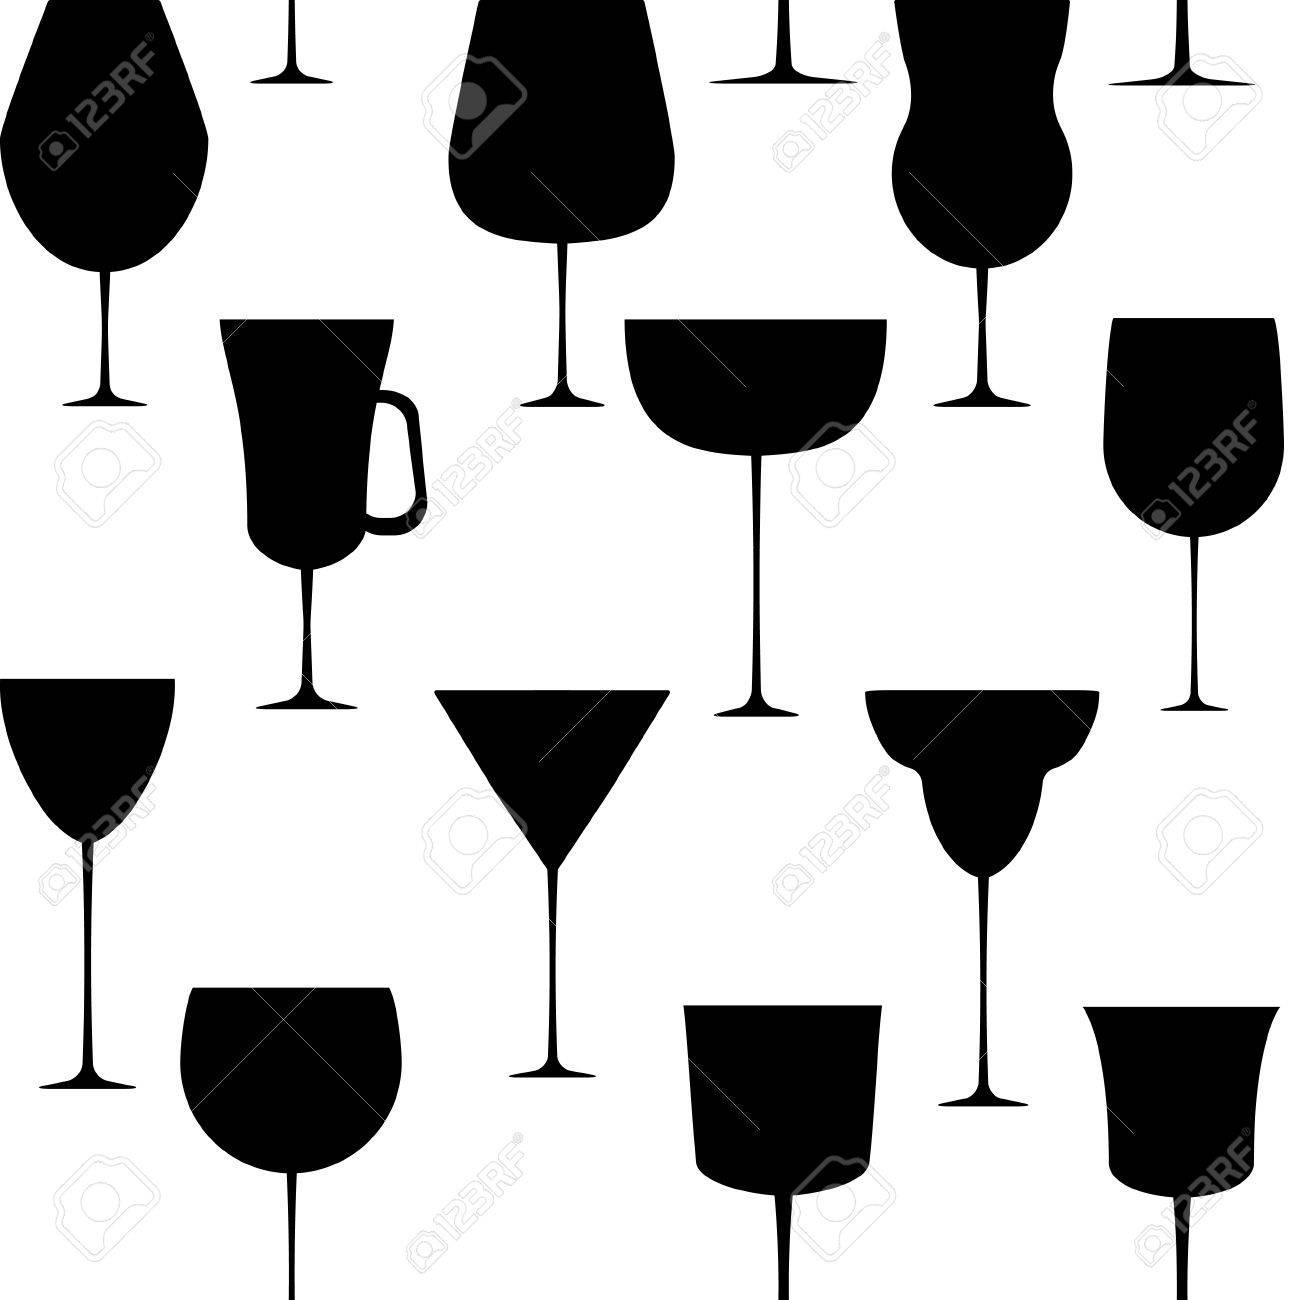 Alcoholic glass seamless pattern  illustration Stock Vector - 16116205